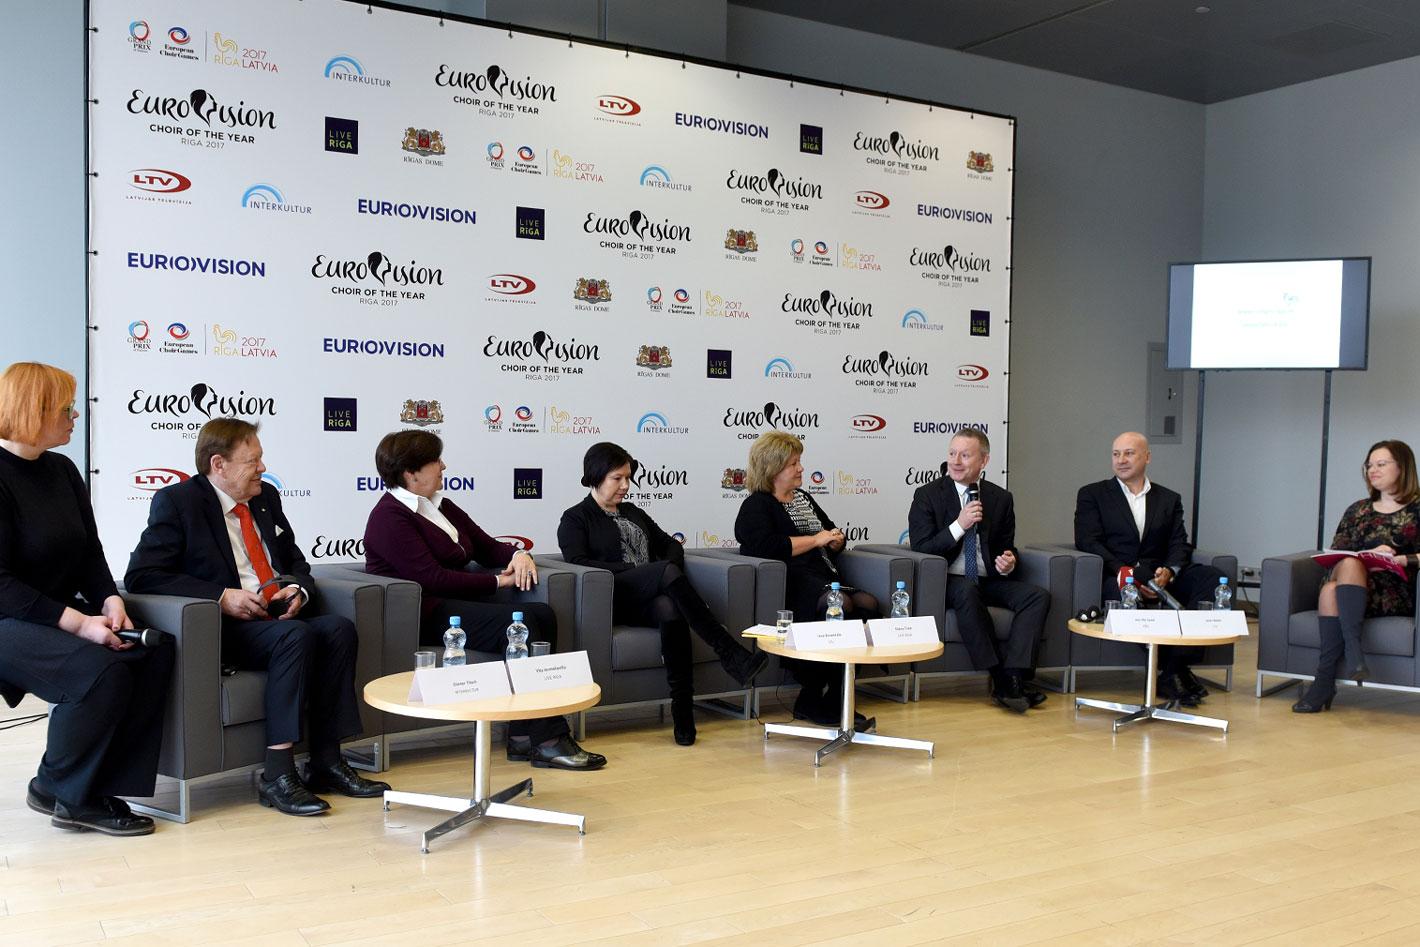 EBU Press Conference